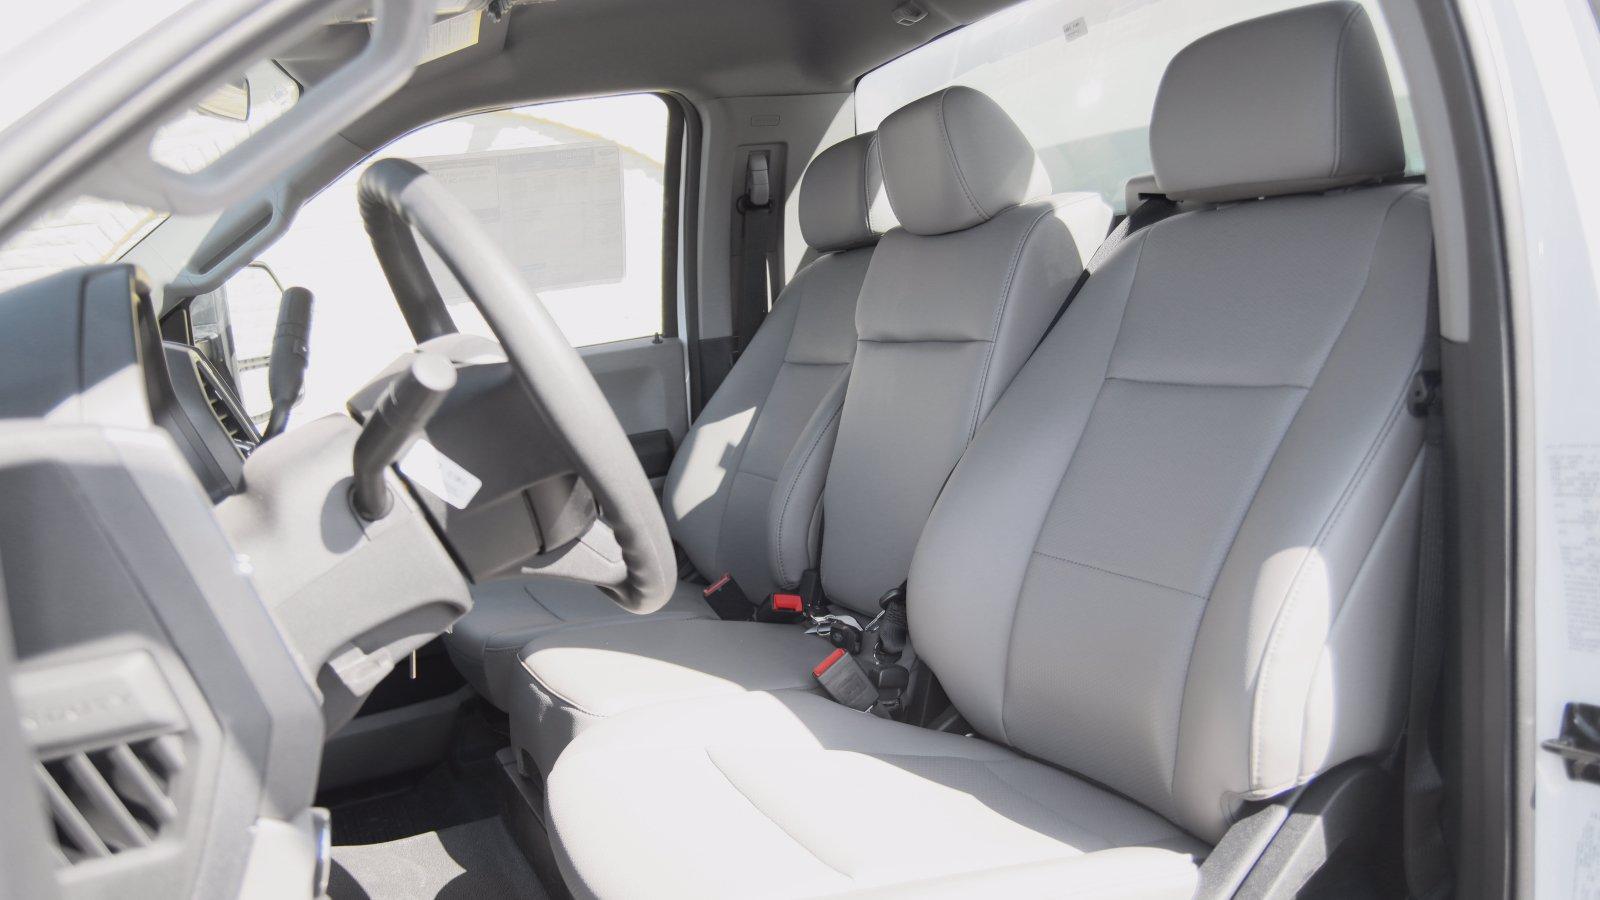 2020 Ford F-550 Regular Cab DRW 4x2, Knapheide Saw Body #07516 - photo 15